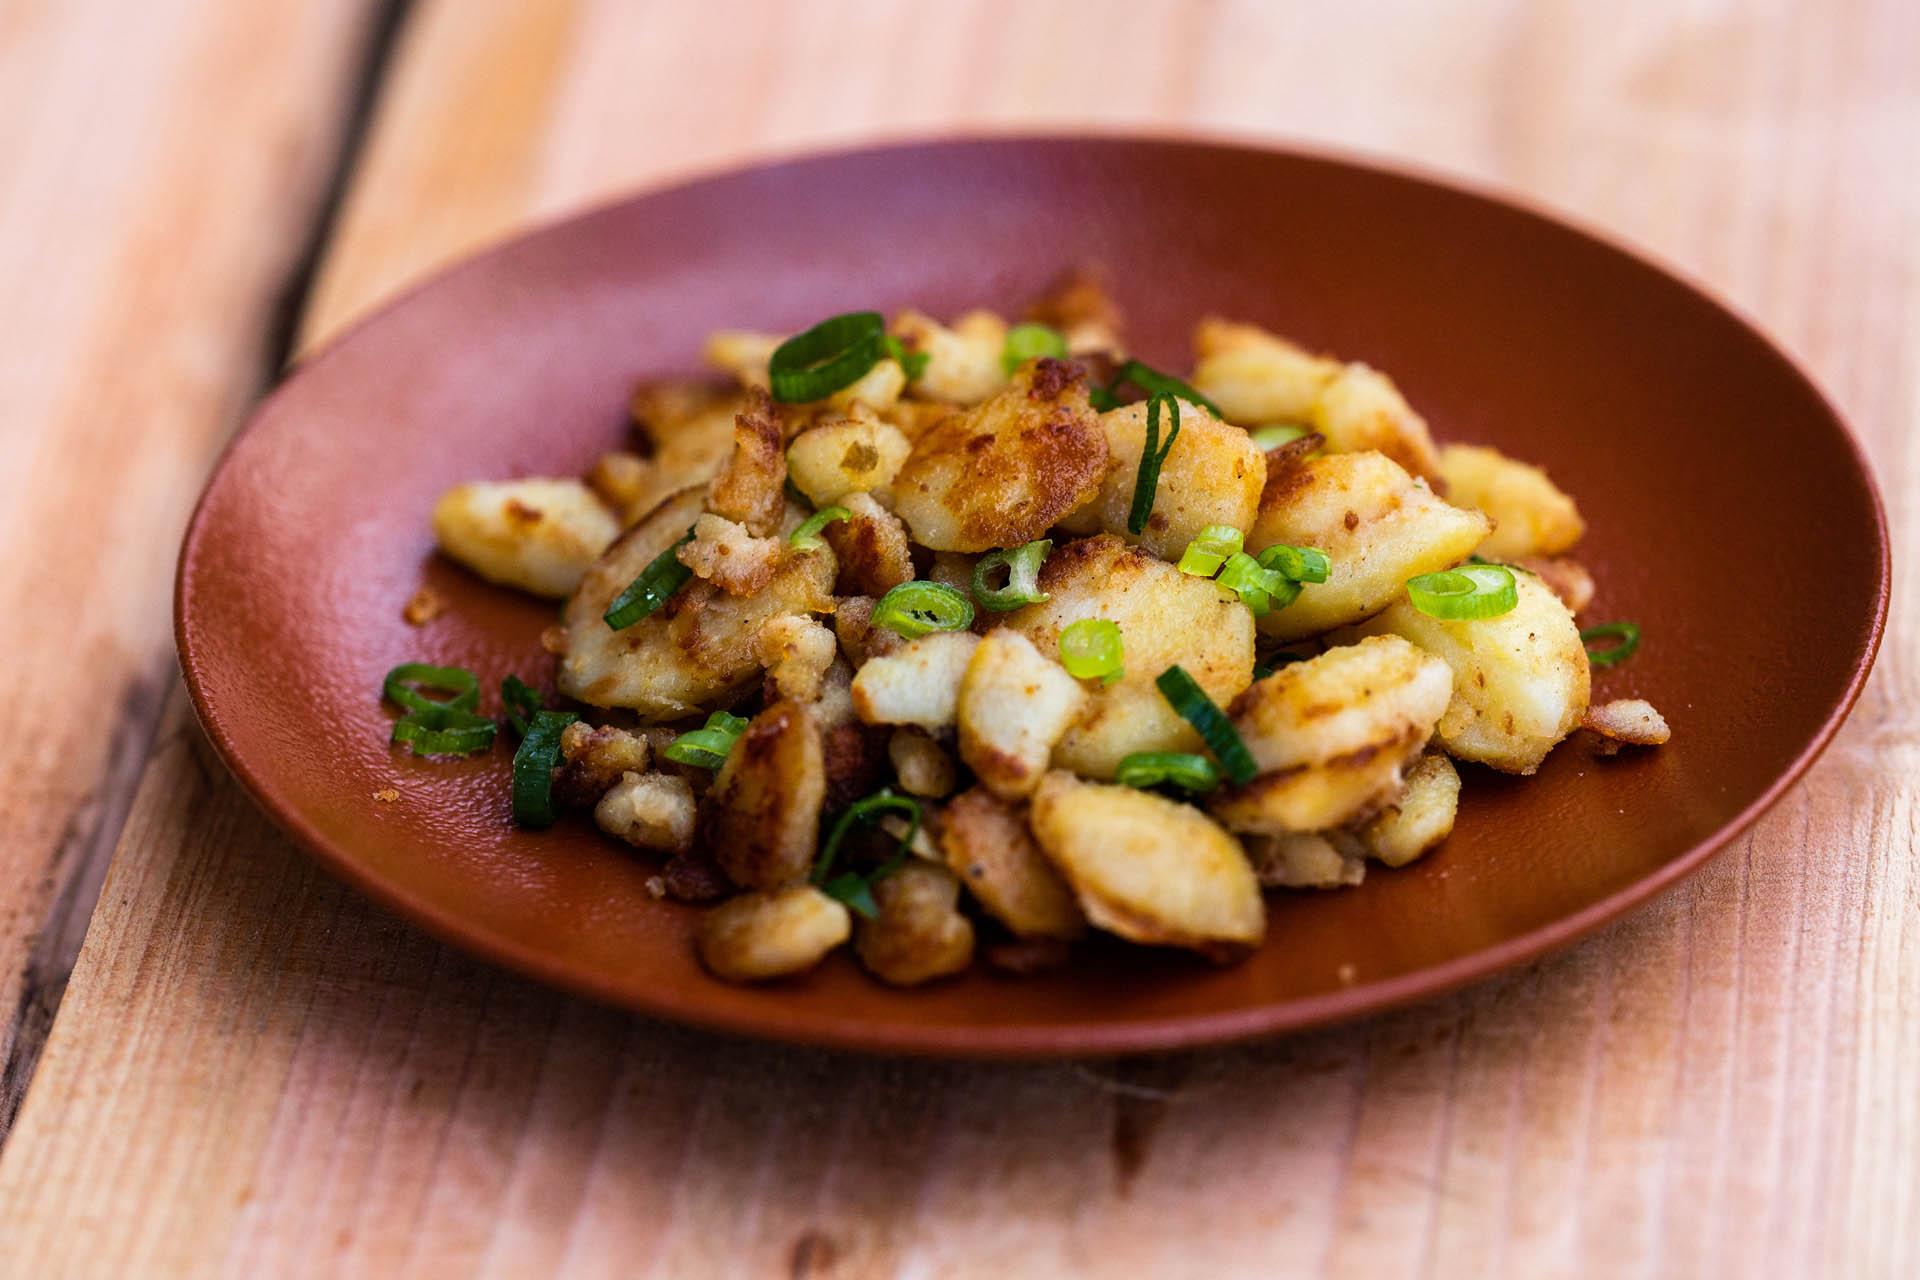 Portion Bratkartoffeln